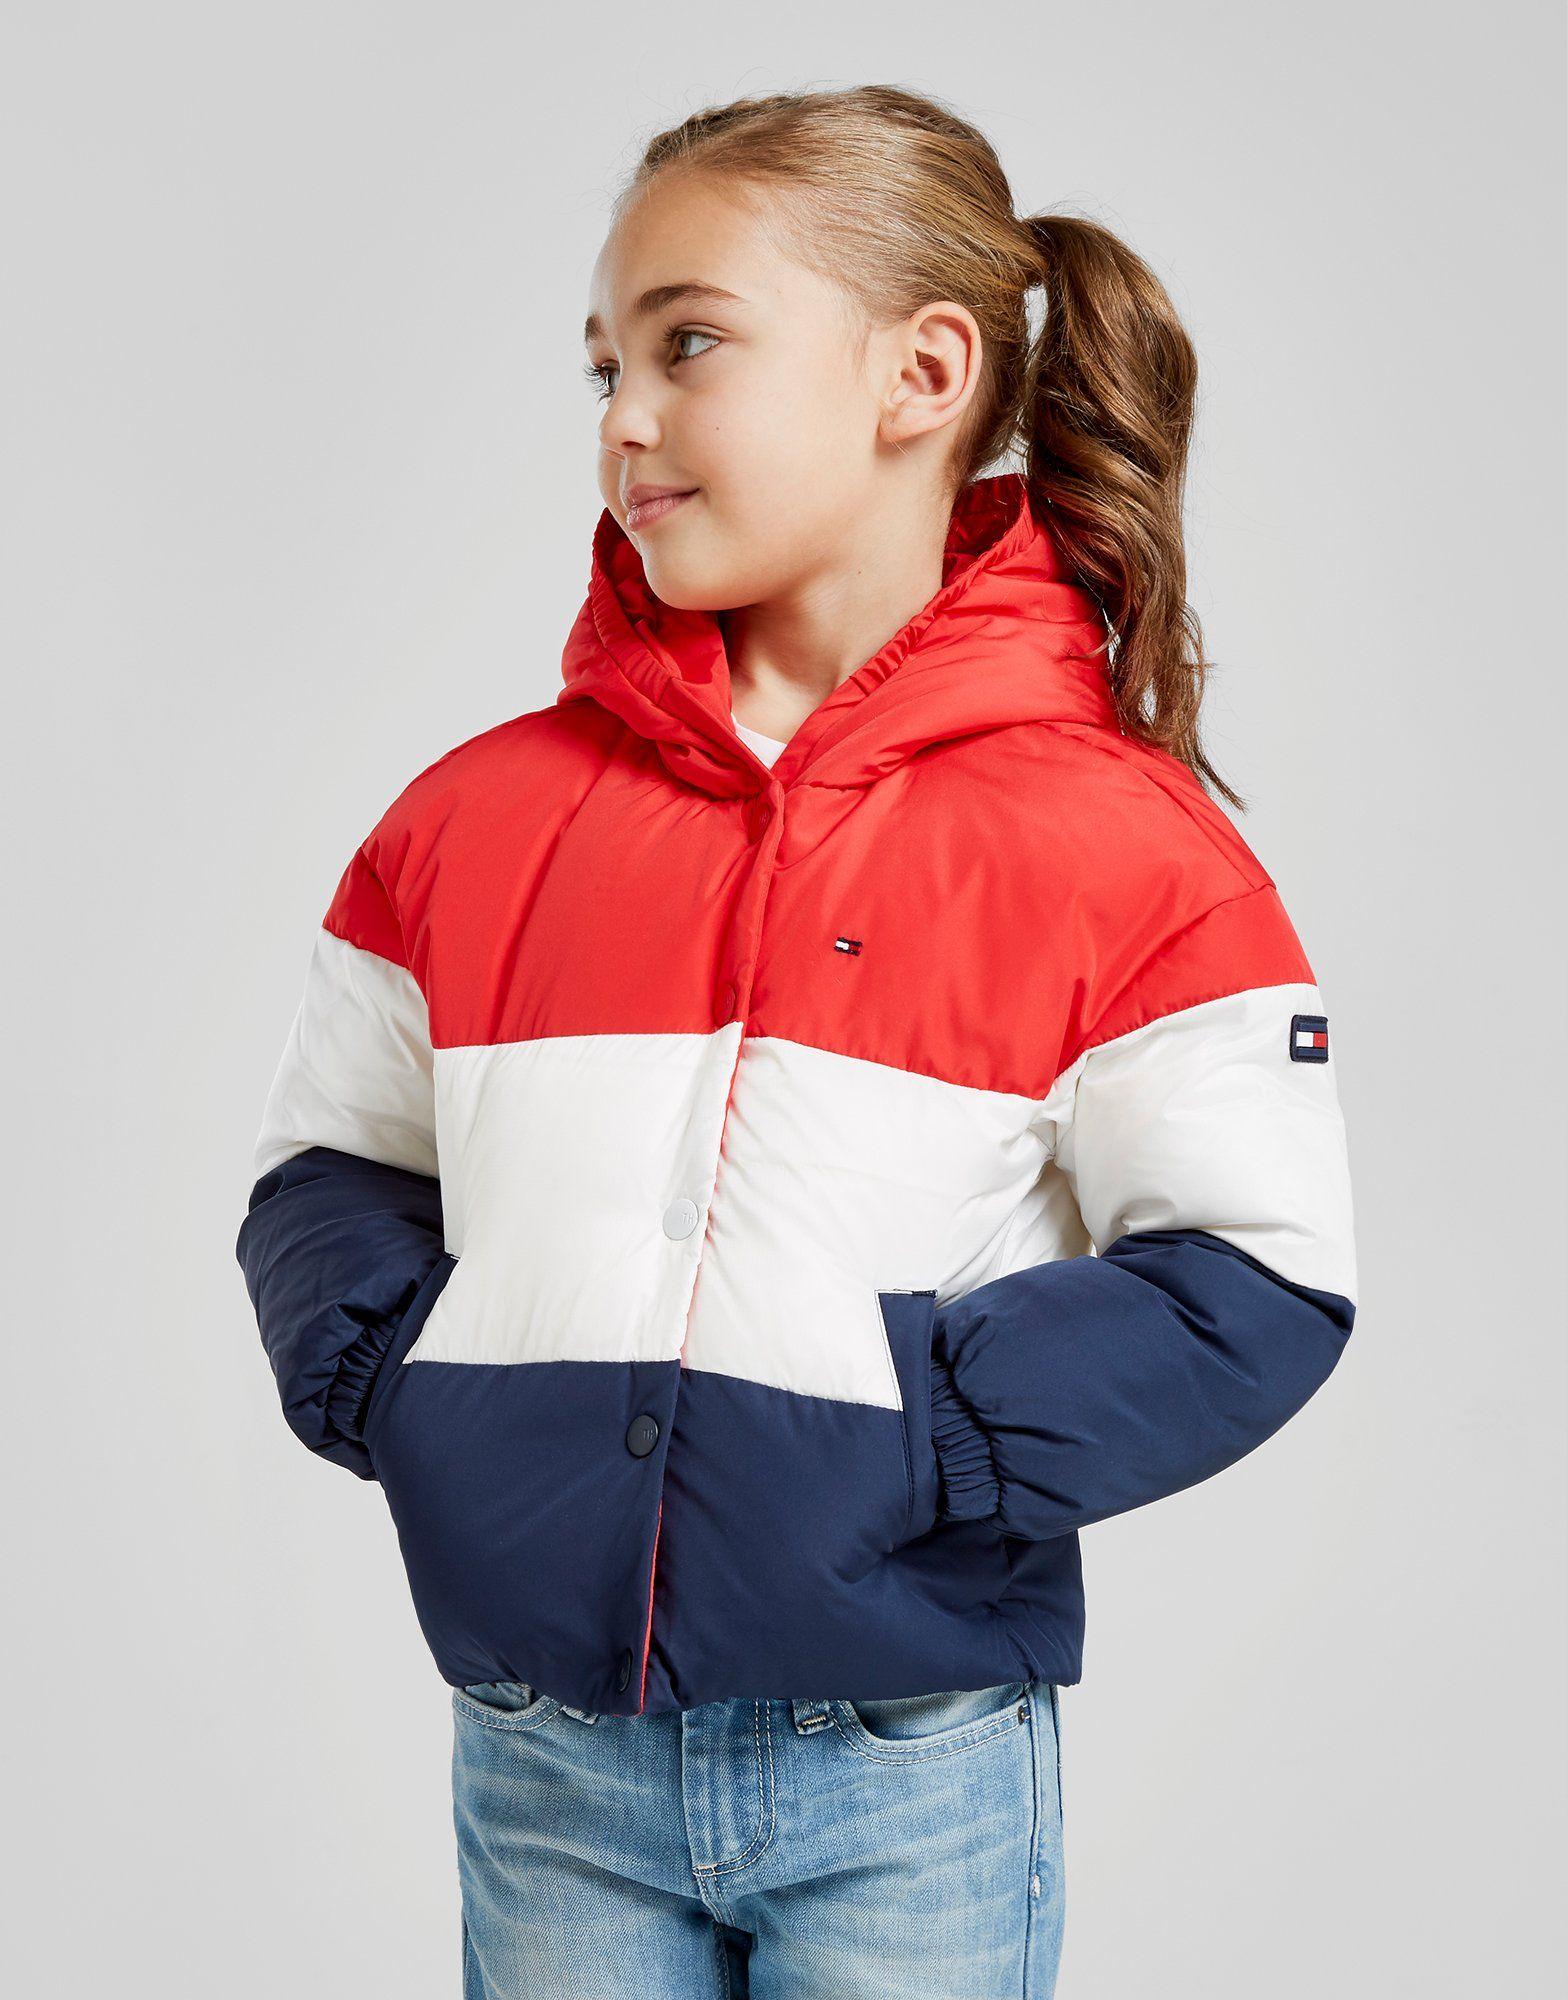 acf0c5d99e Tommy Hilfiger Girls  Colour Block Flag Padded Jacket Children